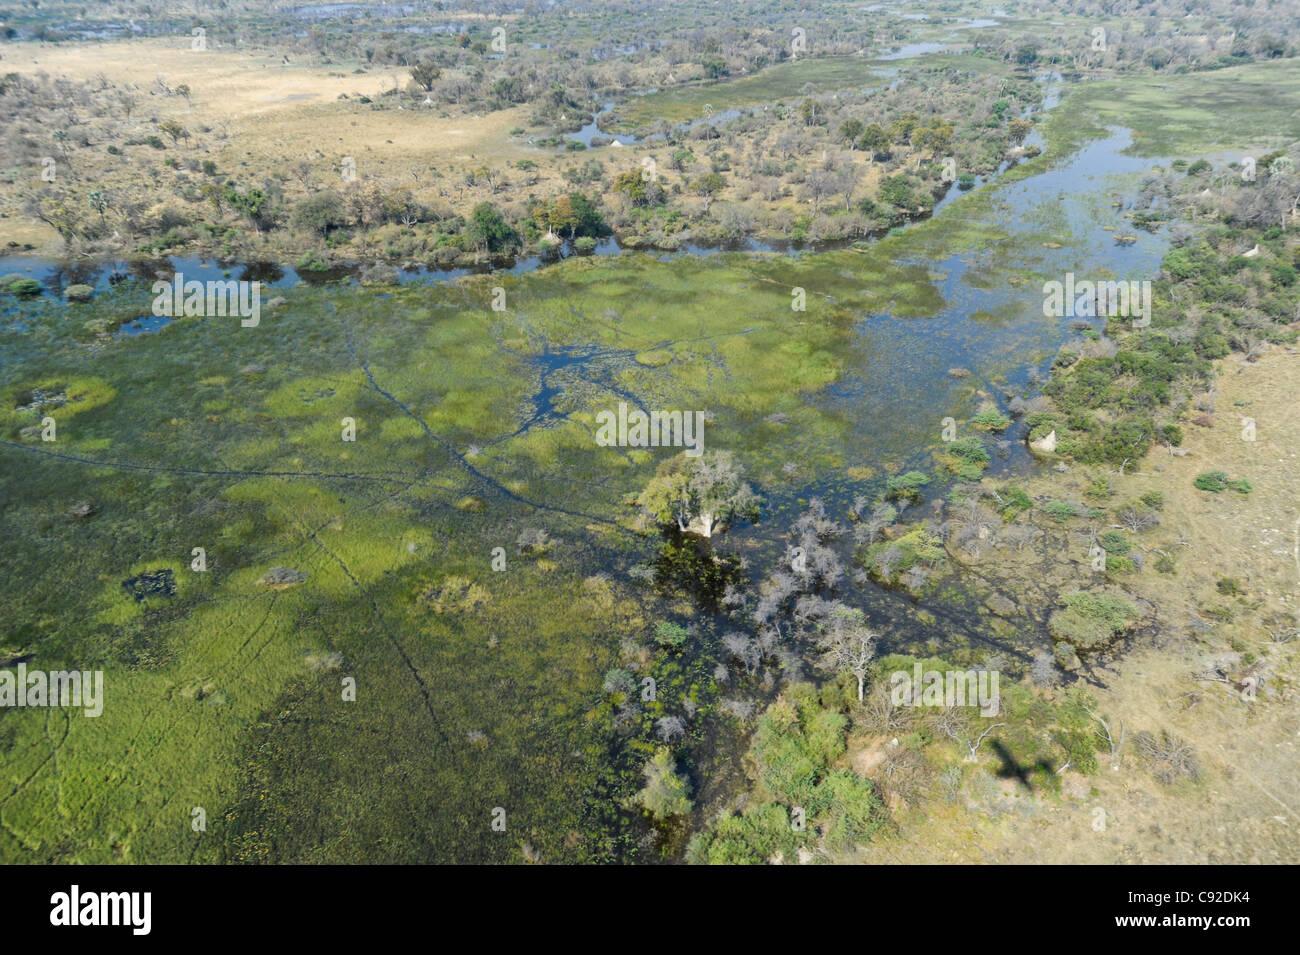 Aerial of Okavango Delta - Stock Image